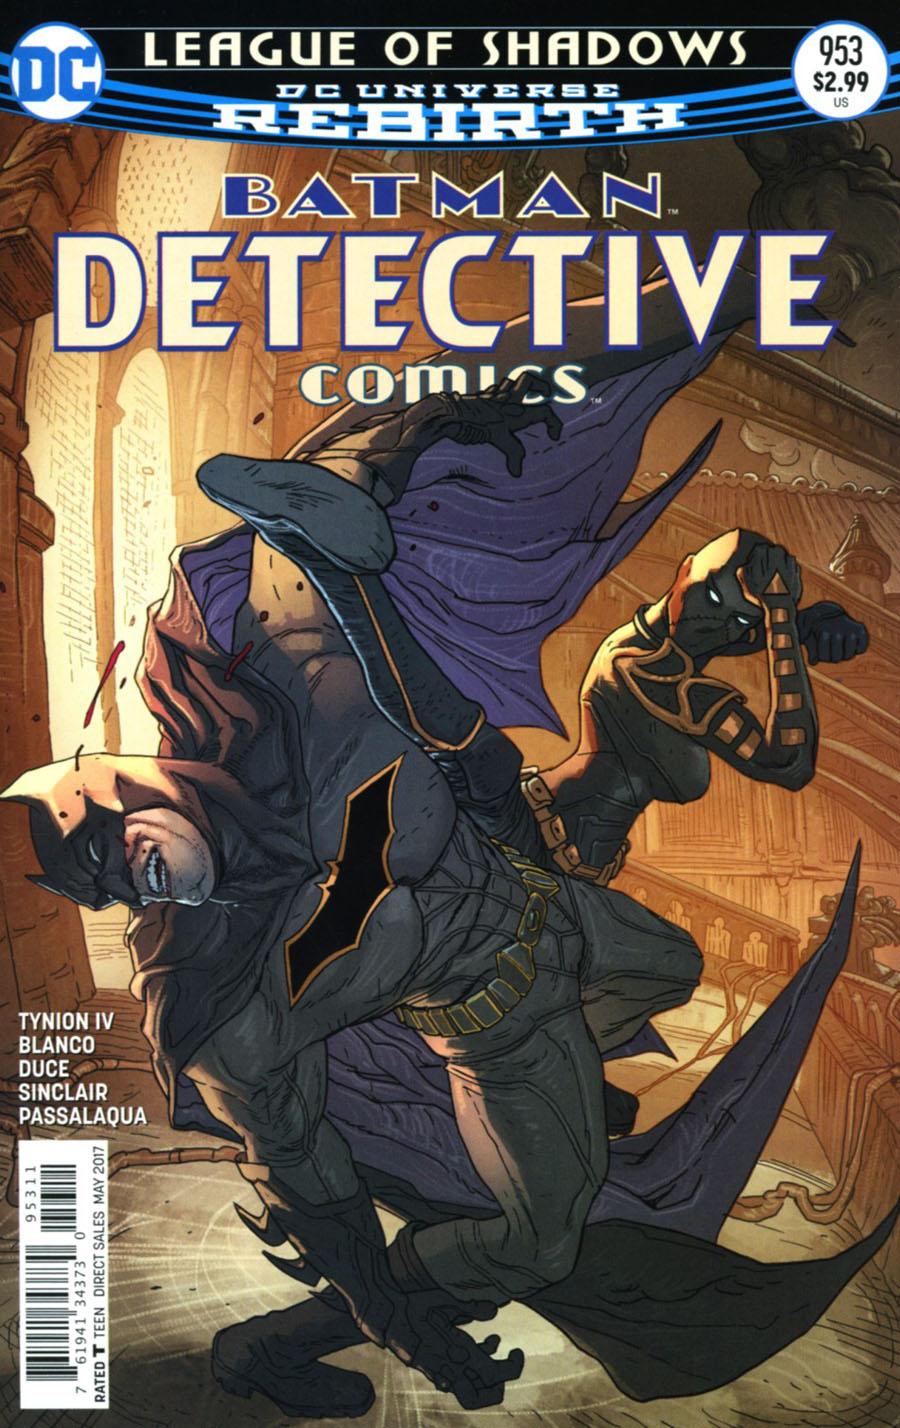 Batman - Detective Comics 953 - League of Shadows 3: Kiss of the Dragon